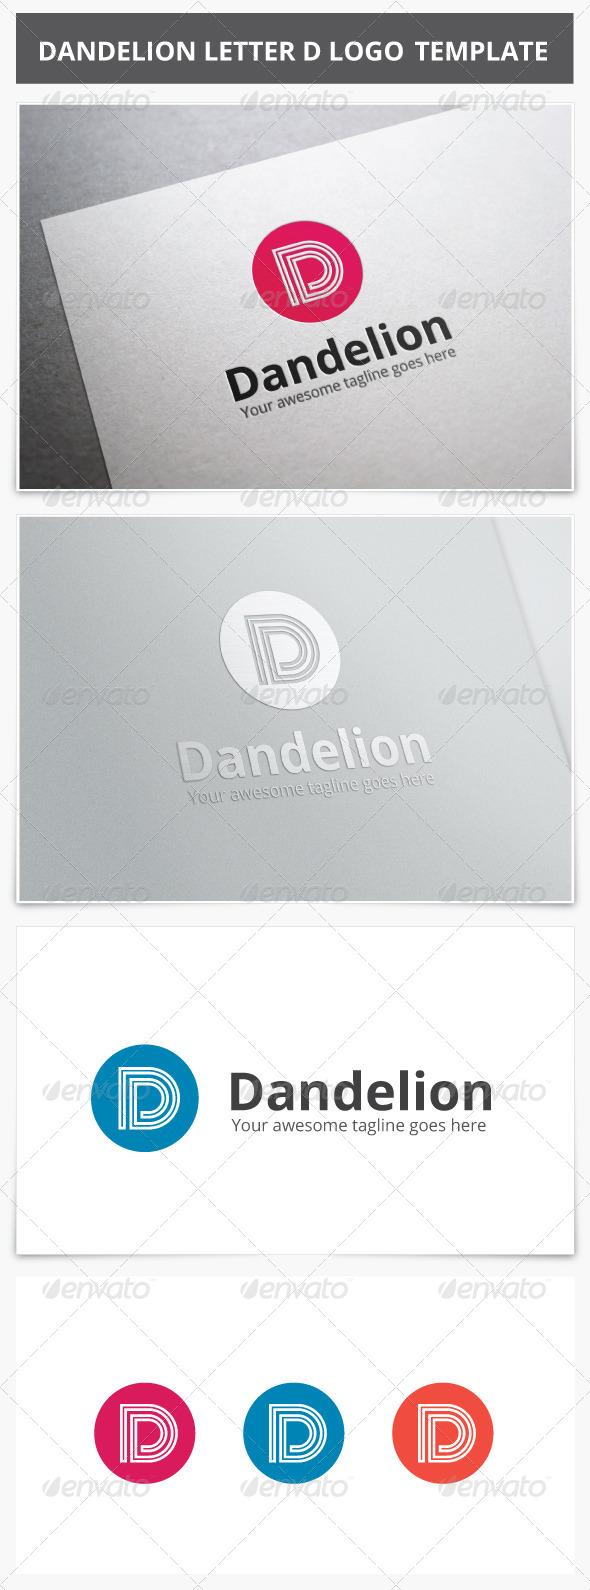 GraphicRiver Dandelion Letter D Logo 7683303